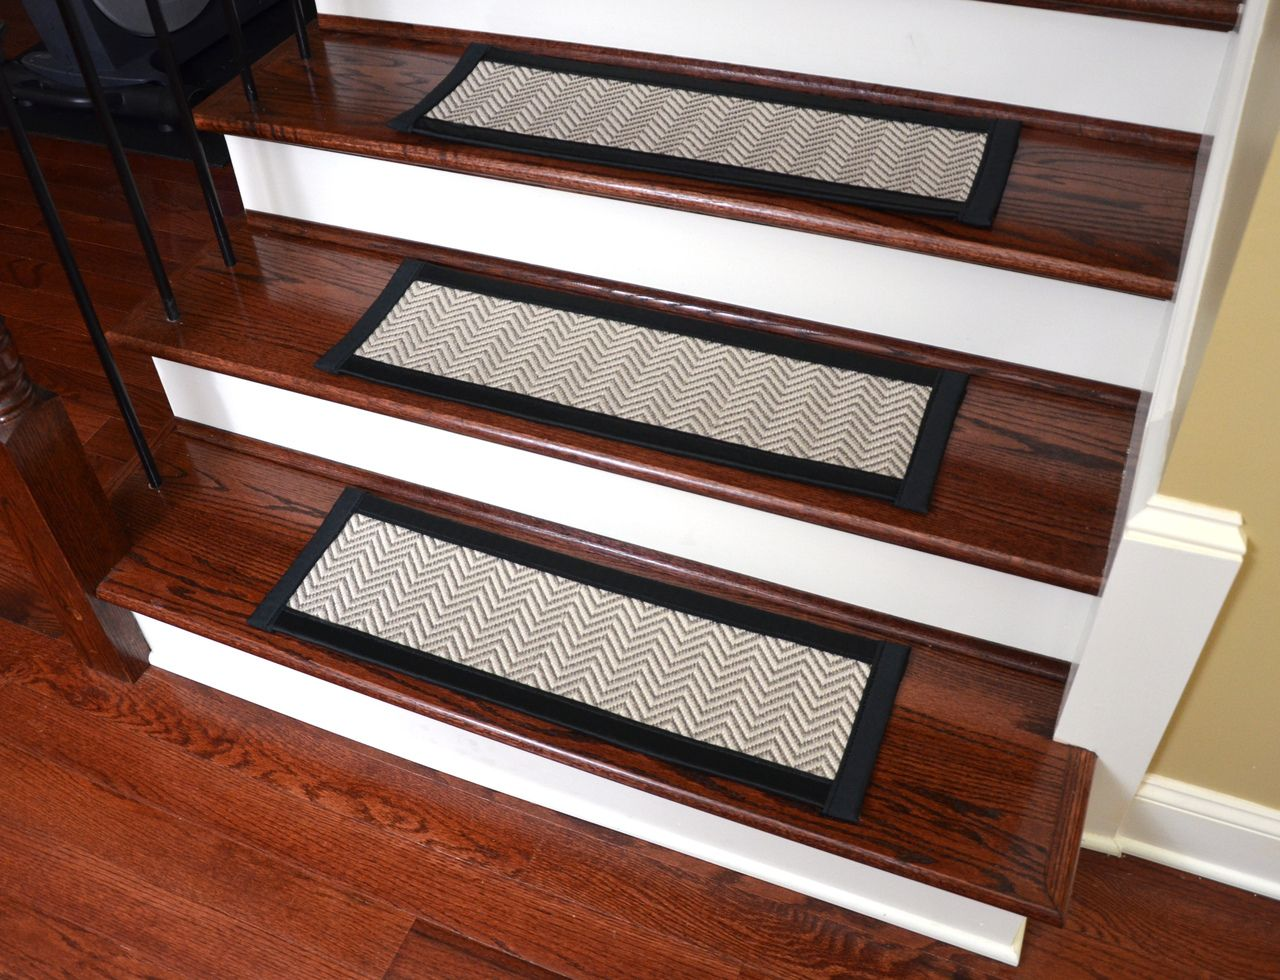 Best Dean Non Slip Tape Free Pet Friendly Dog Helper Stair 400 x 300